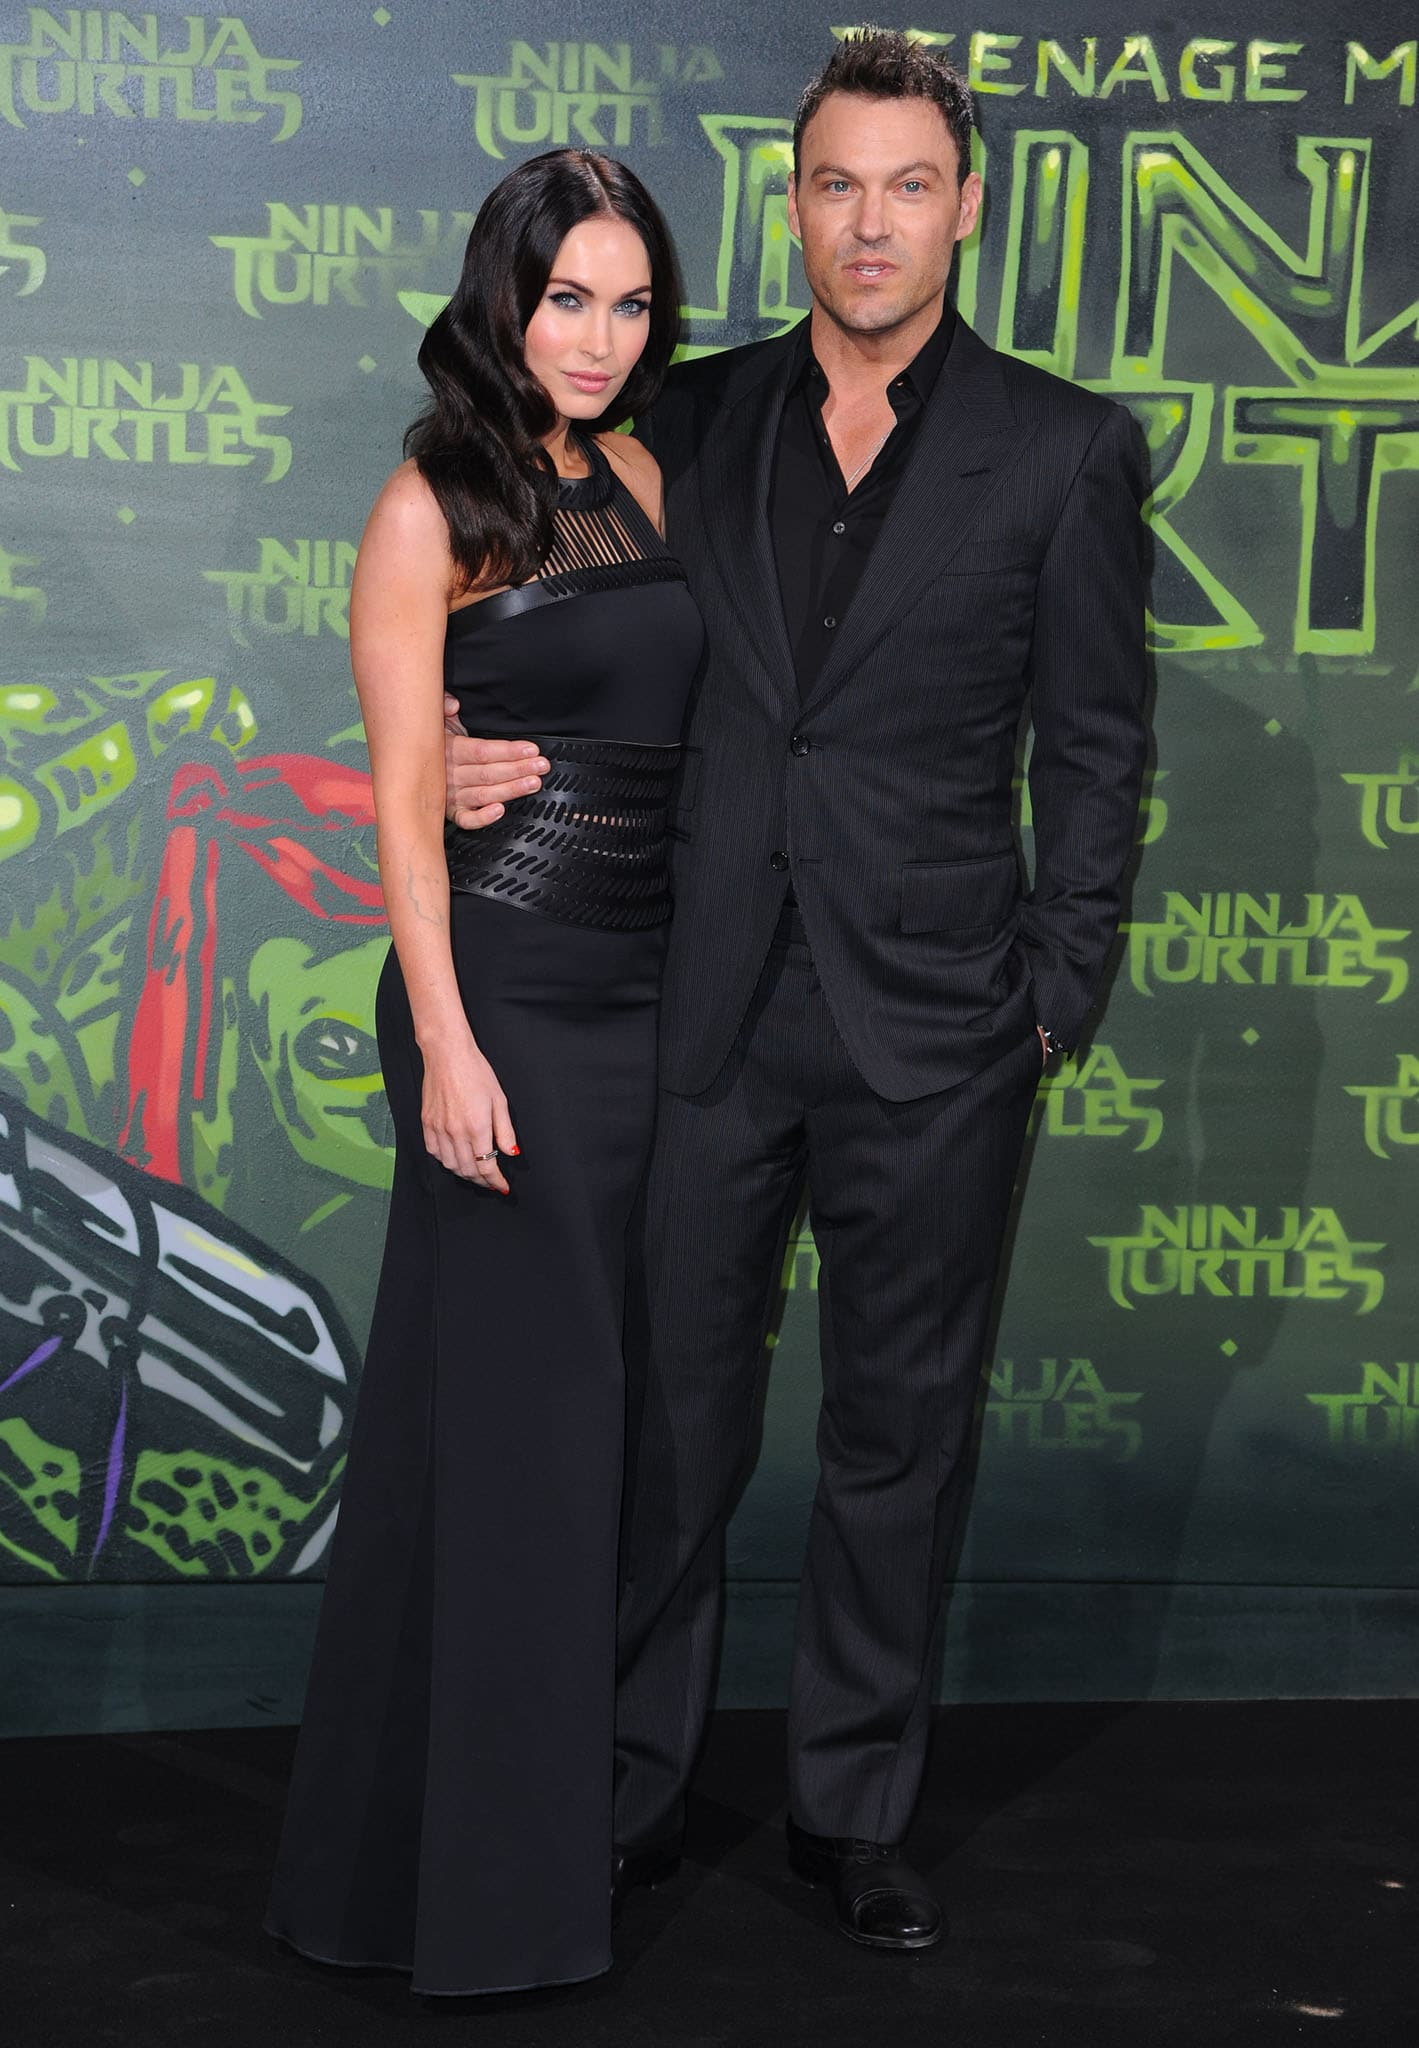 Megan Fox and Brian Austin Green at the German premiere of Teenage Mutant Ninja Turtles on October 5, 2014